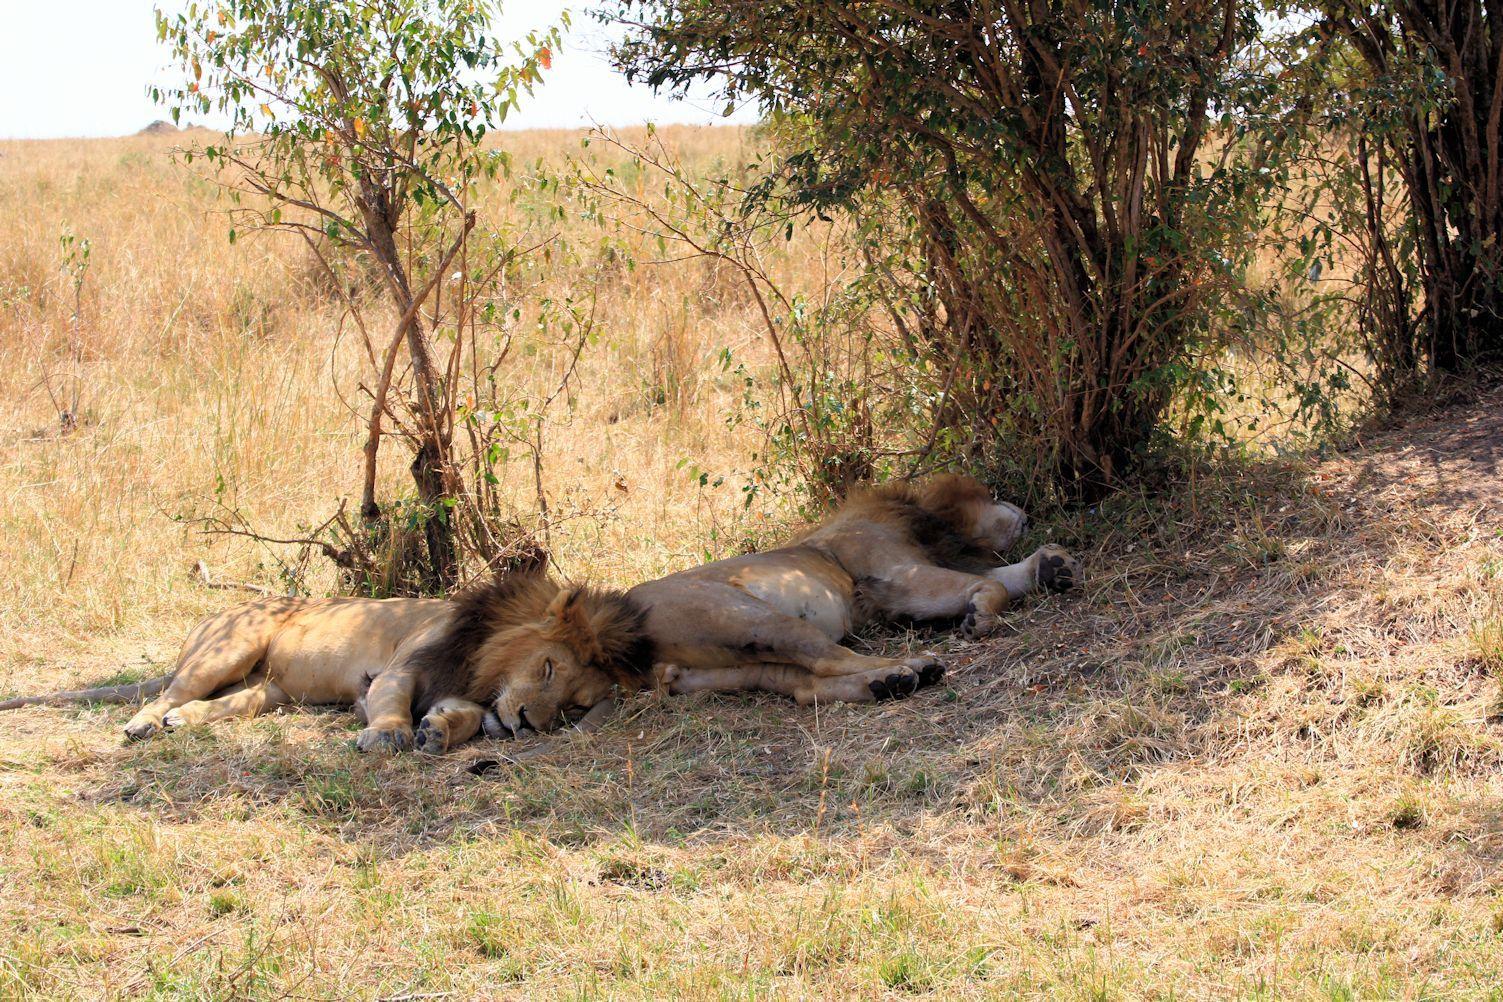 Maasai Mara Lions. Part 3